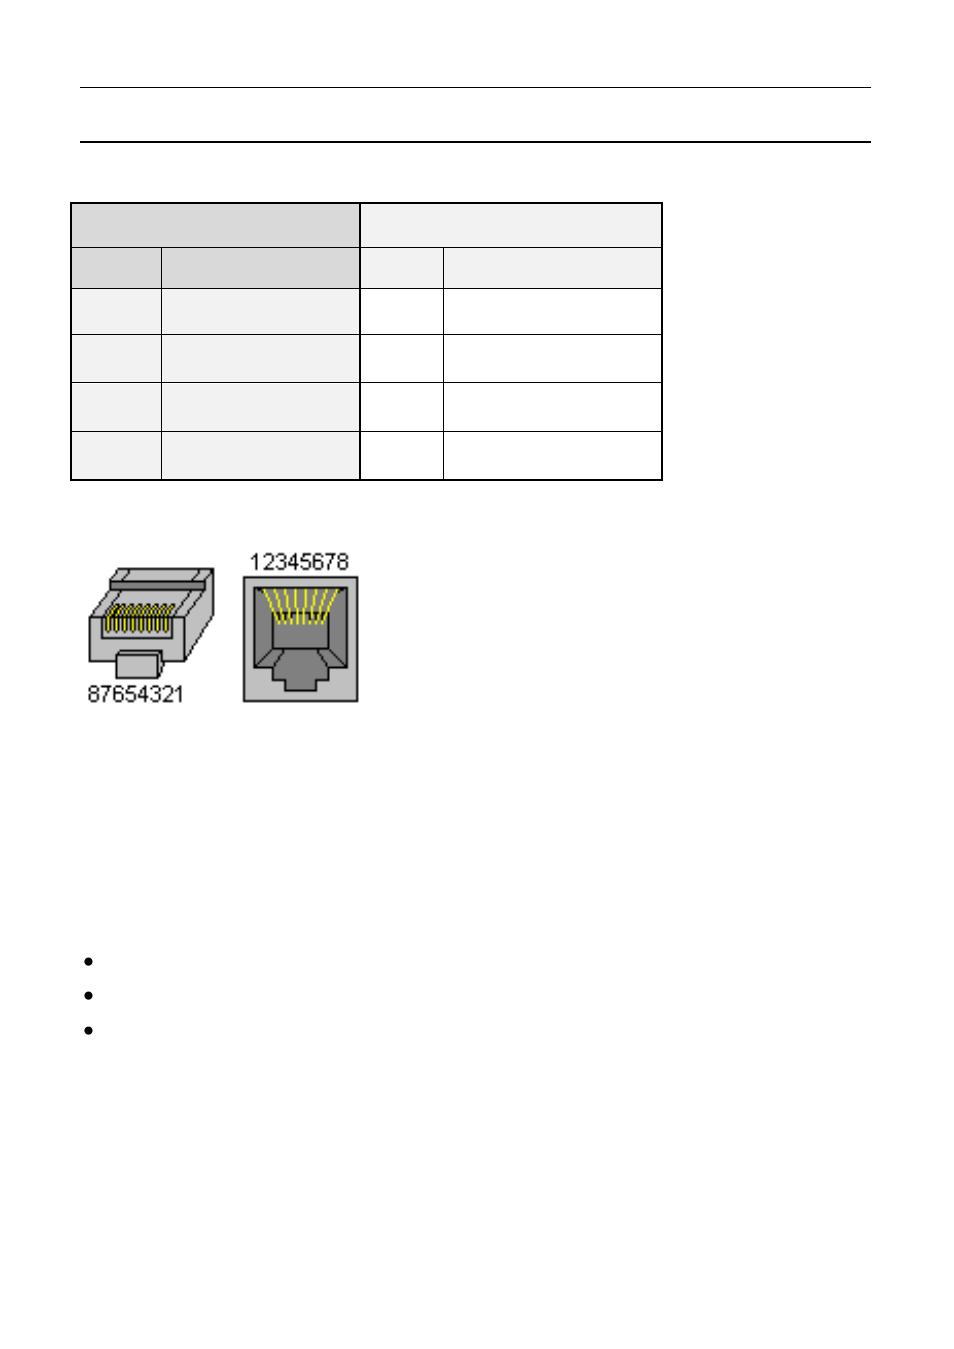 medium resolution of ethernet wiring diagram tx rx basic electronics wiring diagram ethernet wiring diagram tx rx